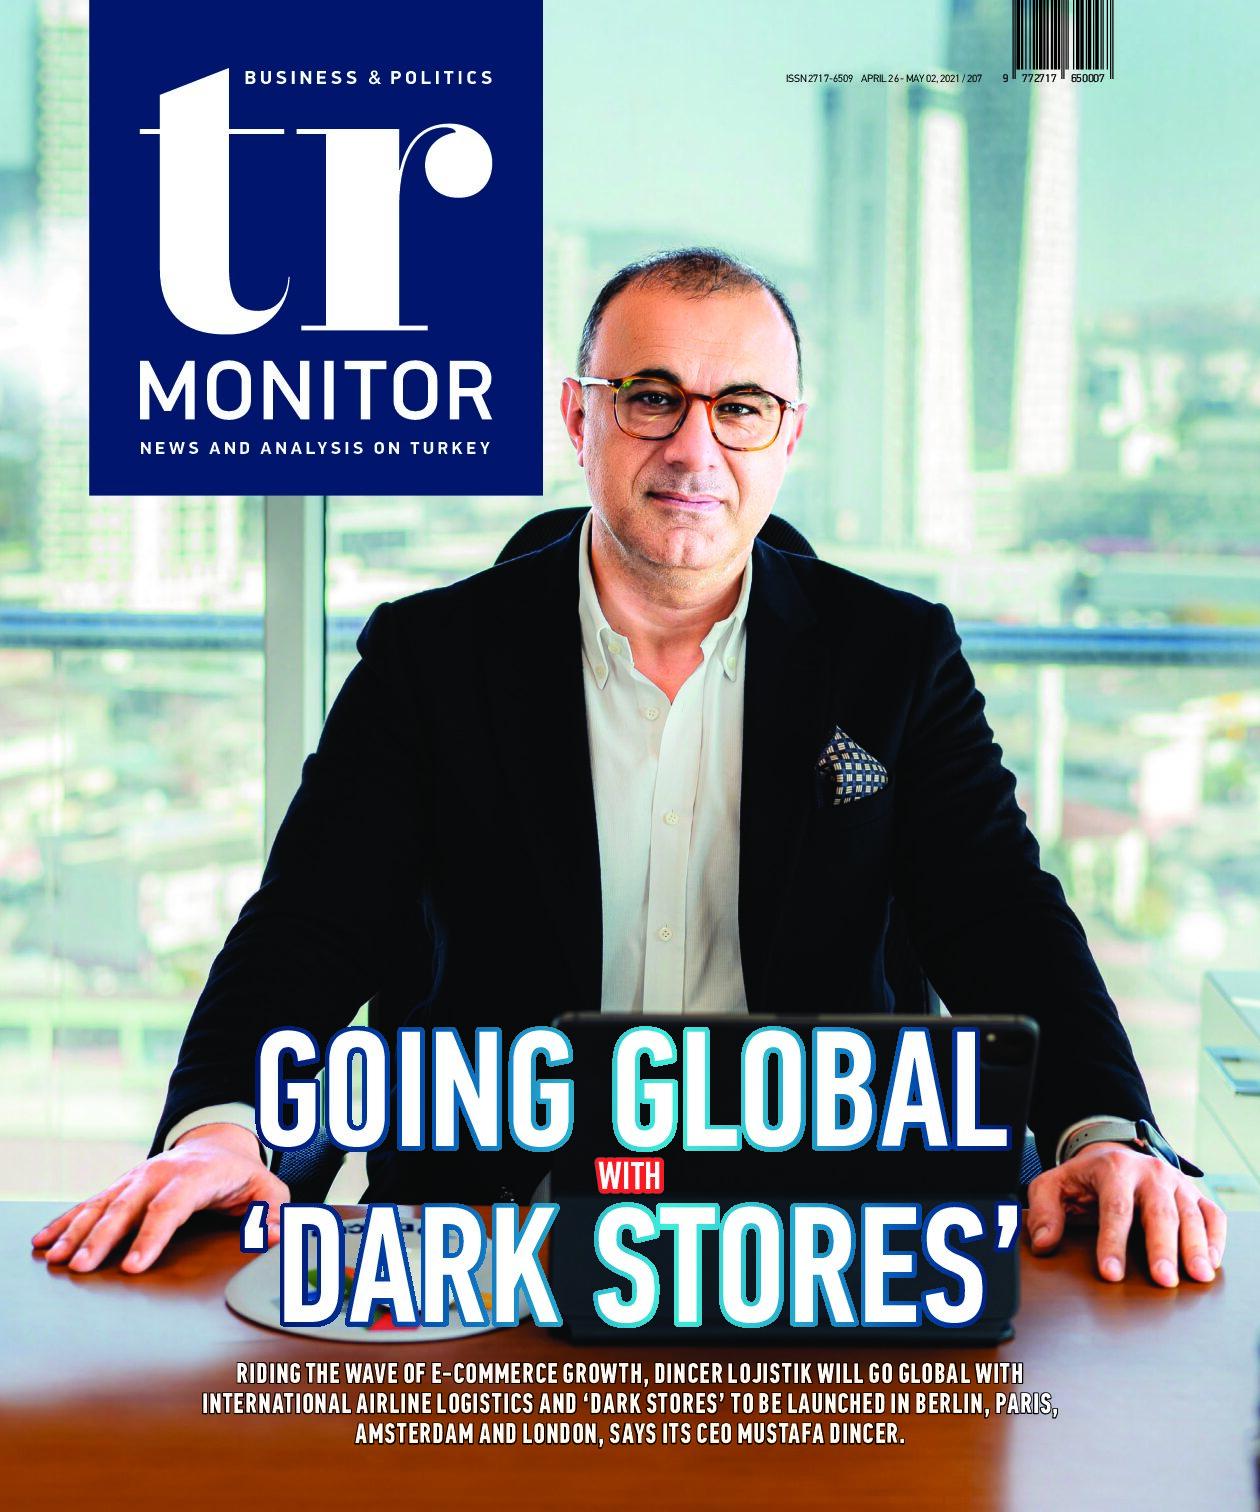 Dincer Lojistik to launch dark stores in Europe